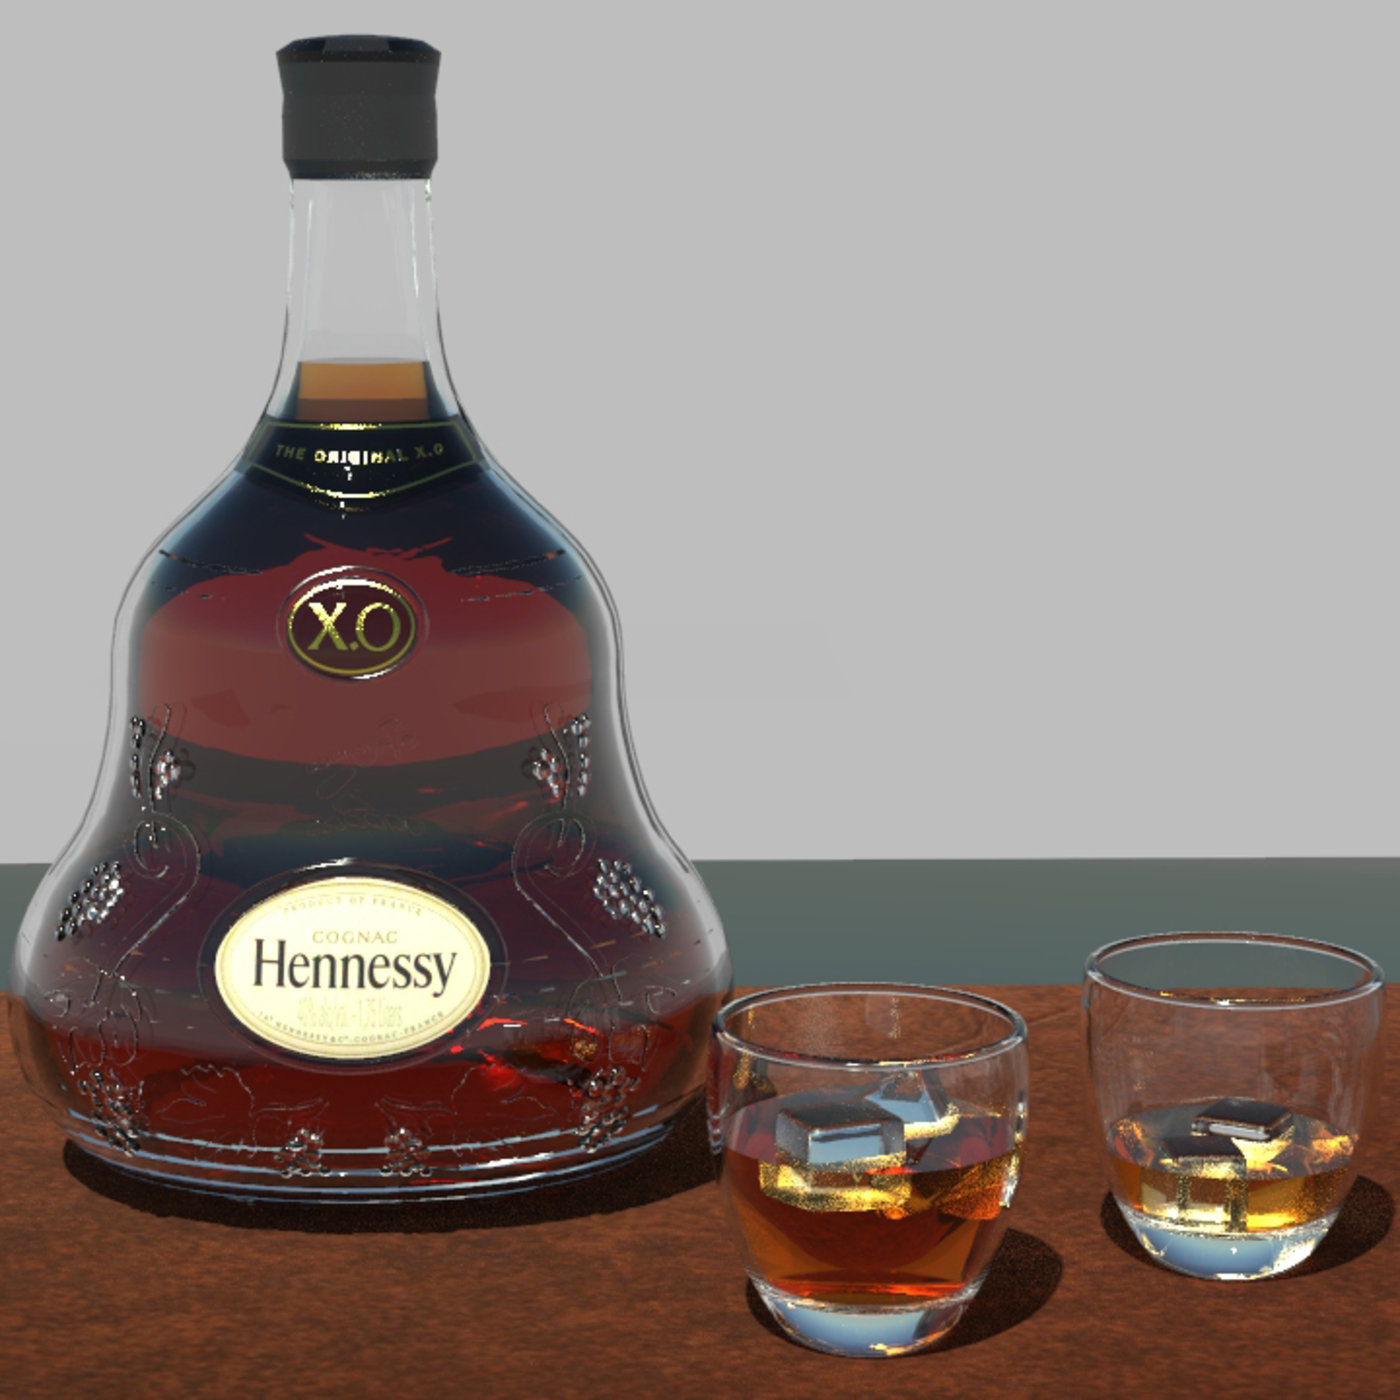 Drinking Hennessey!